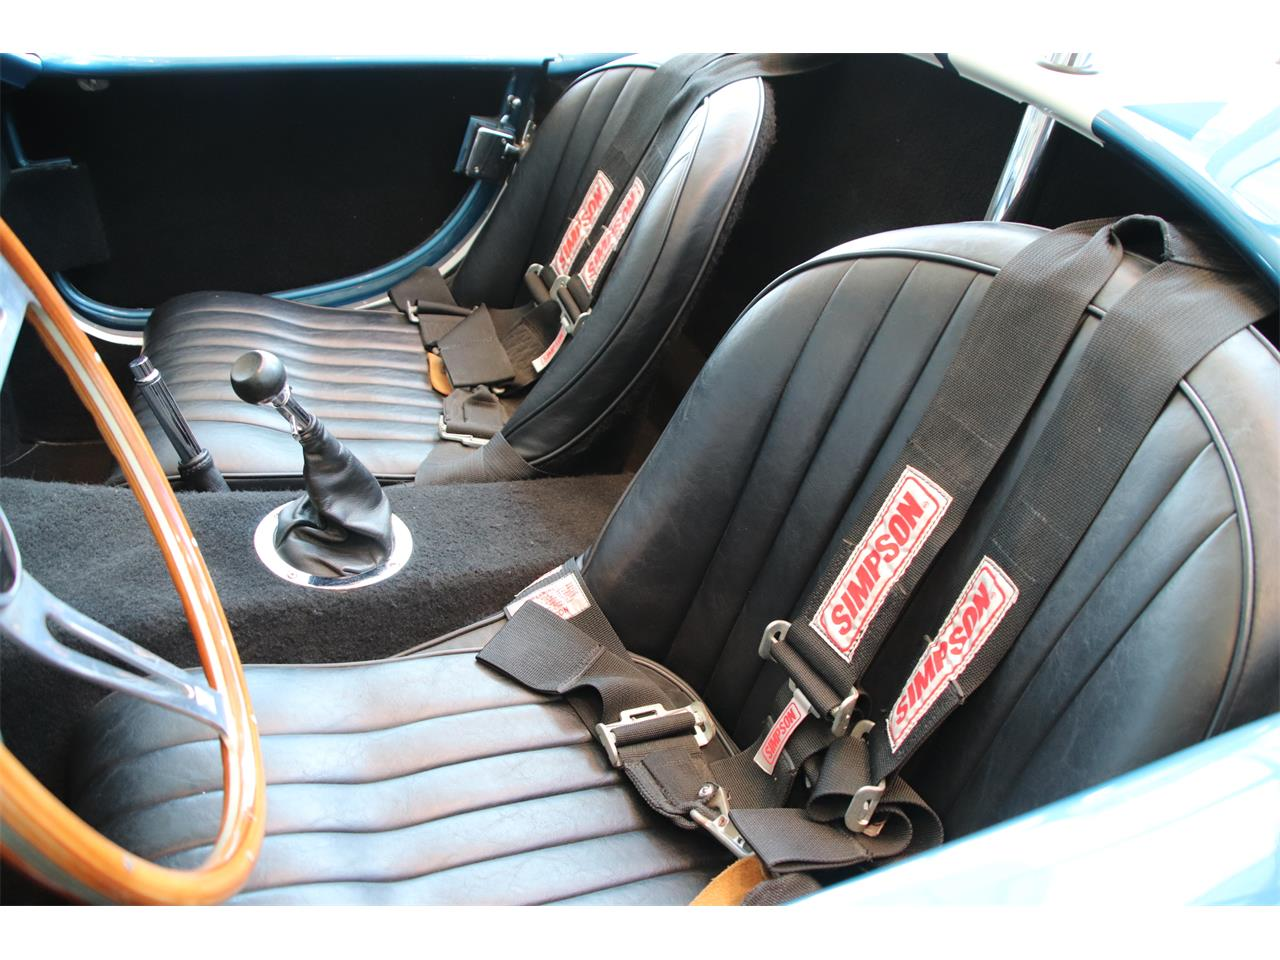 1965 Shelby CSX 4000 (CC-1363523) for sale in Selma, California